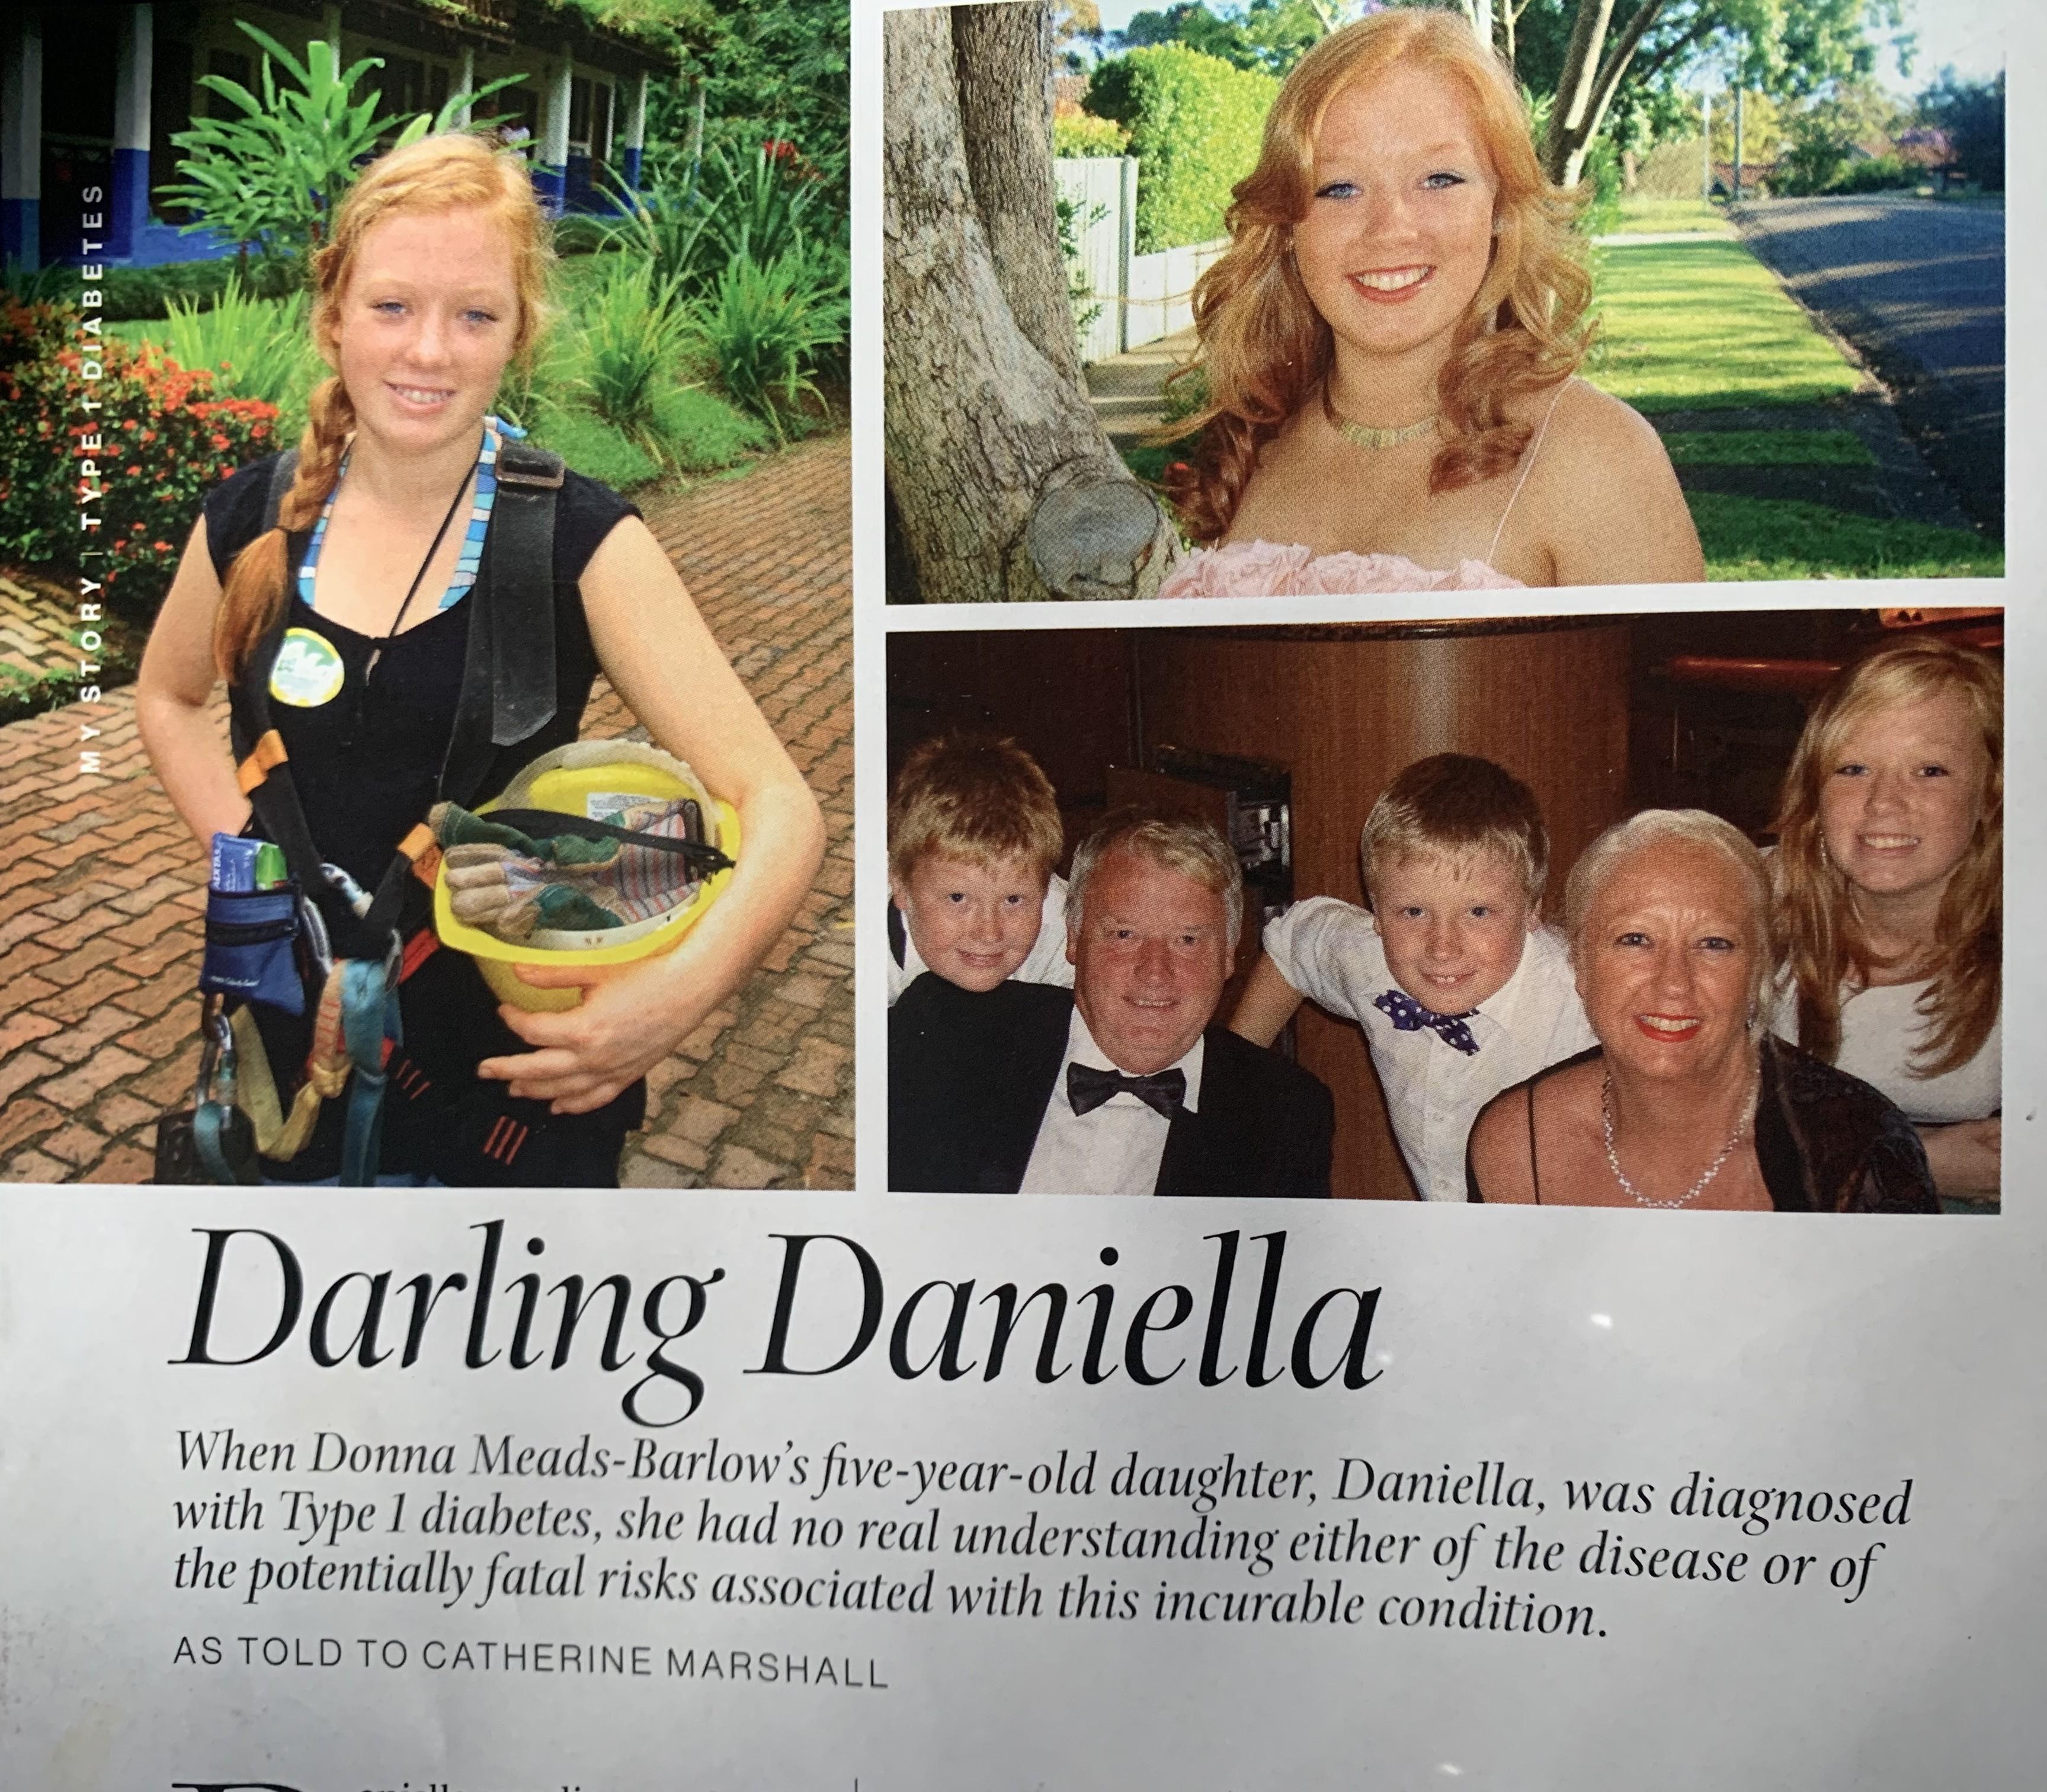 08NOV19 Mindfood Darling Daniella